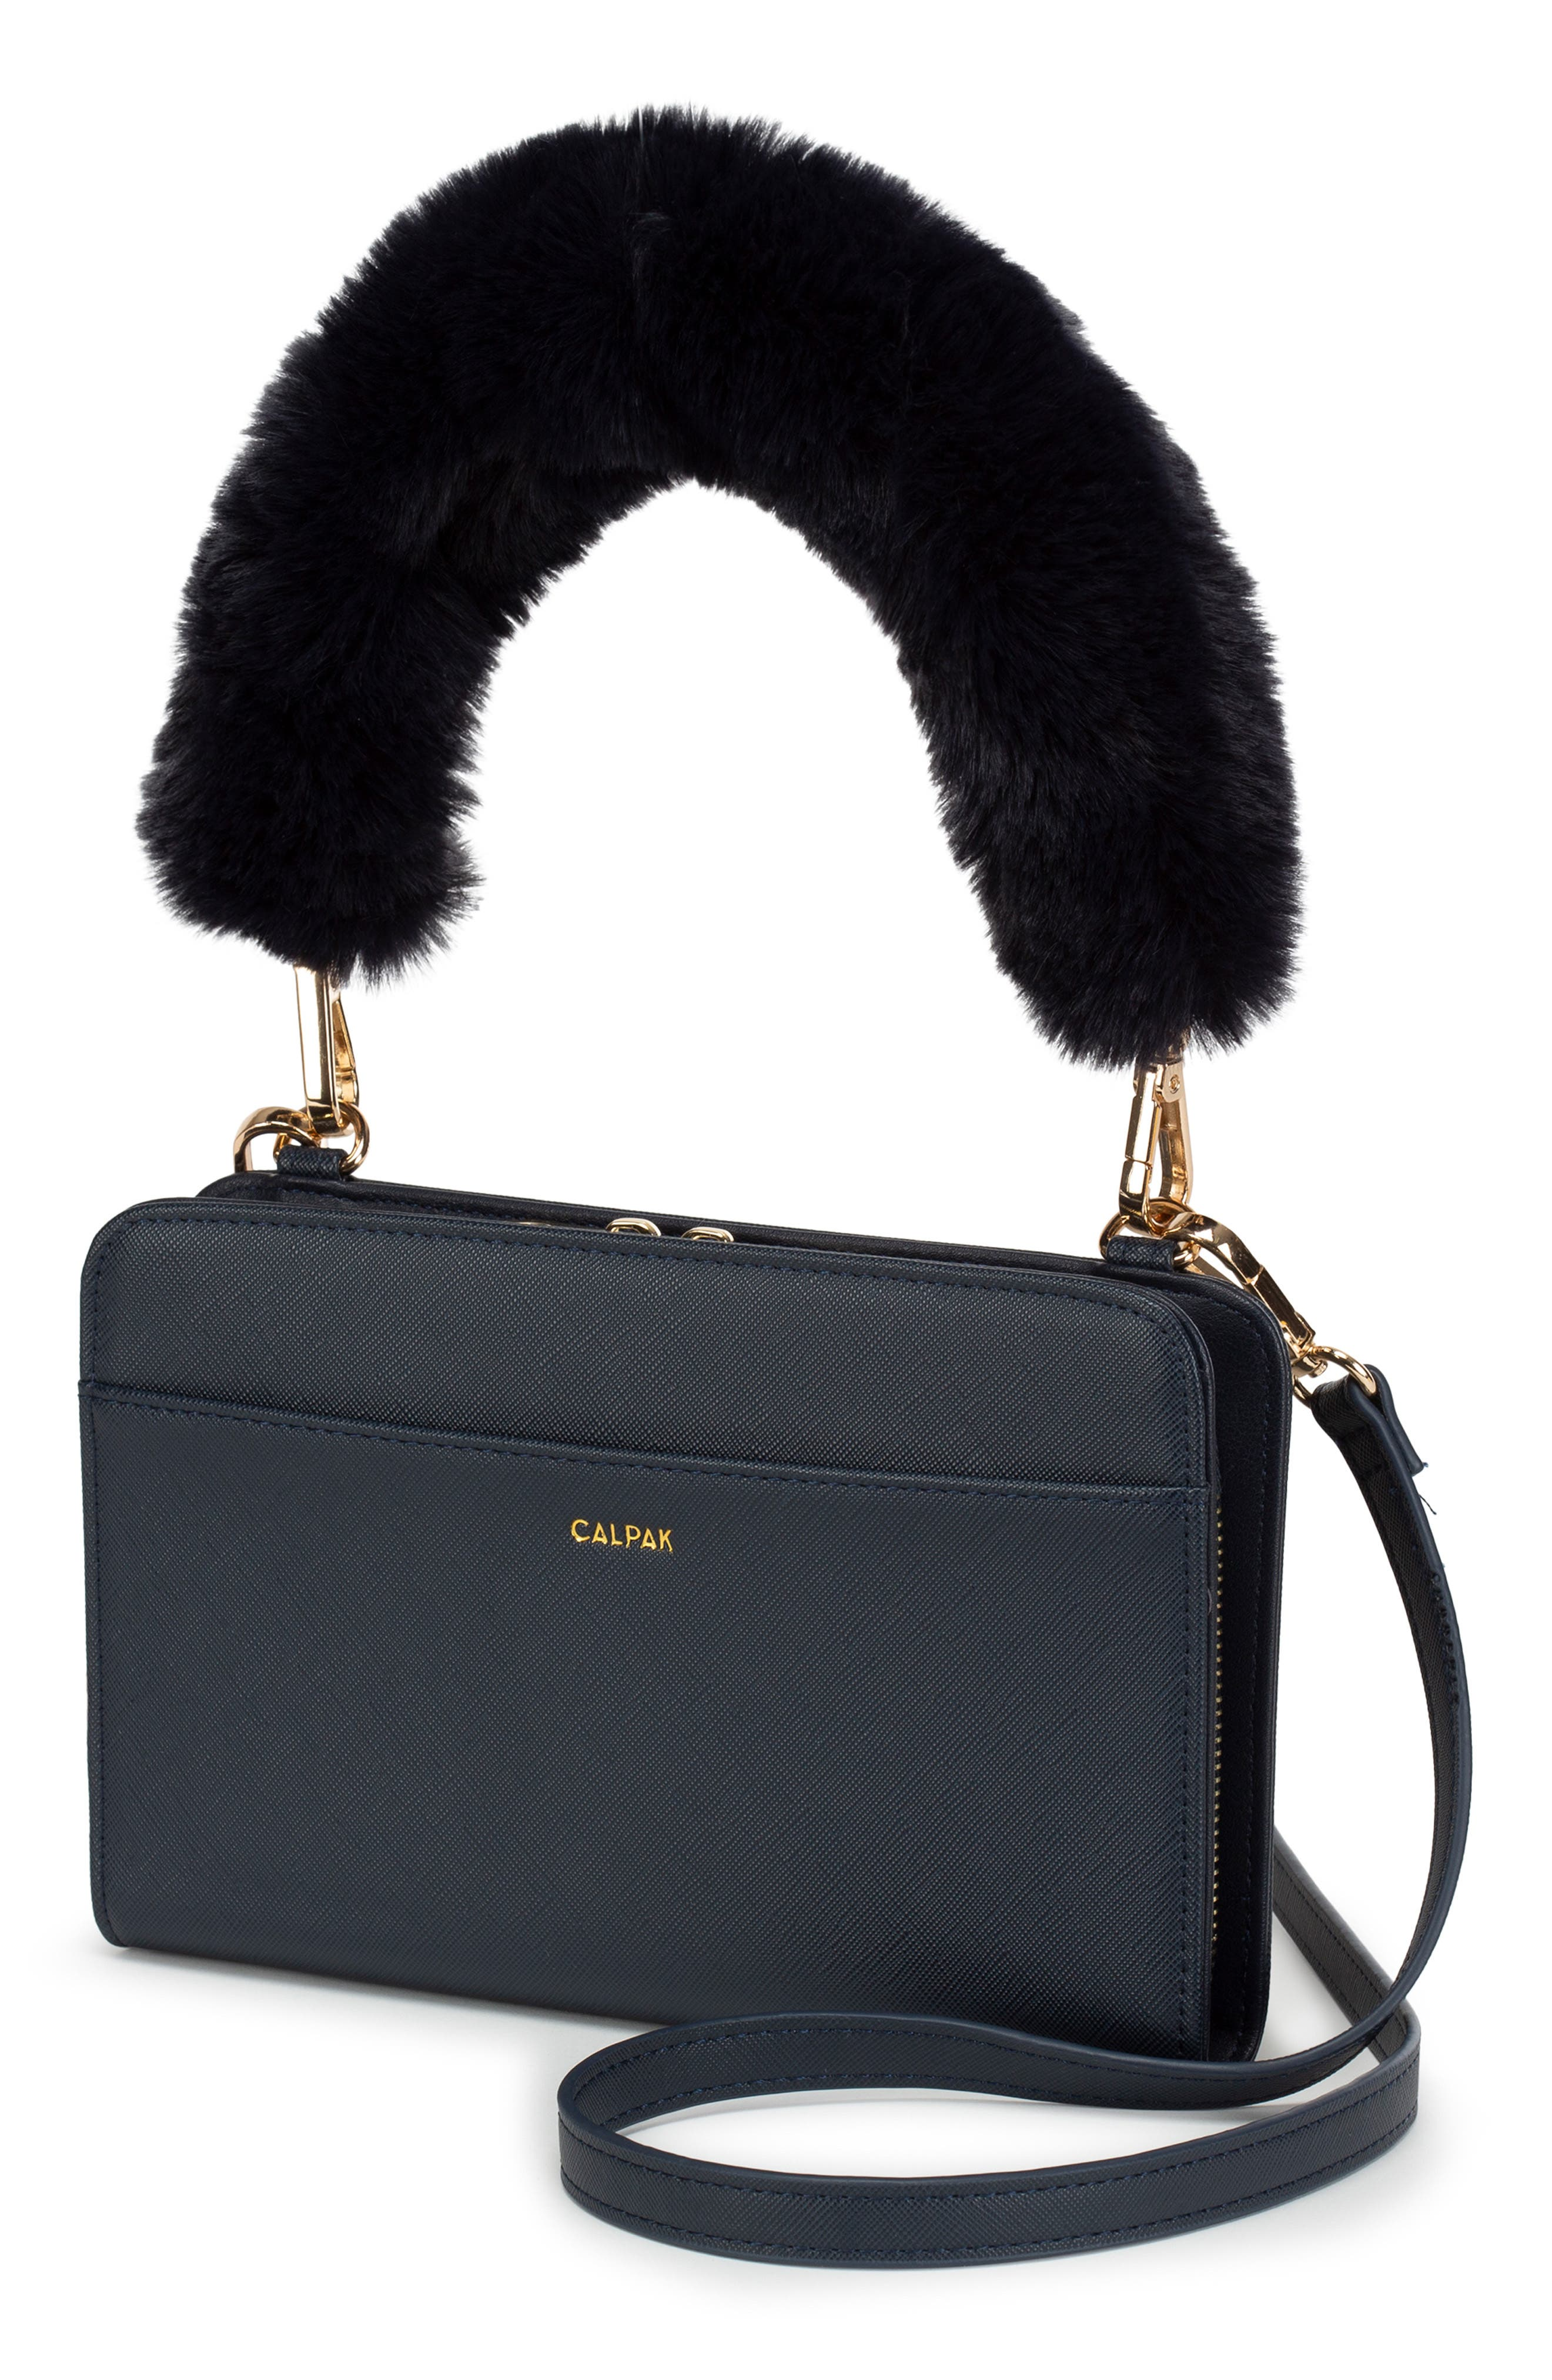 454a7025fb65 Faux Fur Handbags & Wallets for Women | Nordstrom